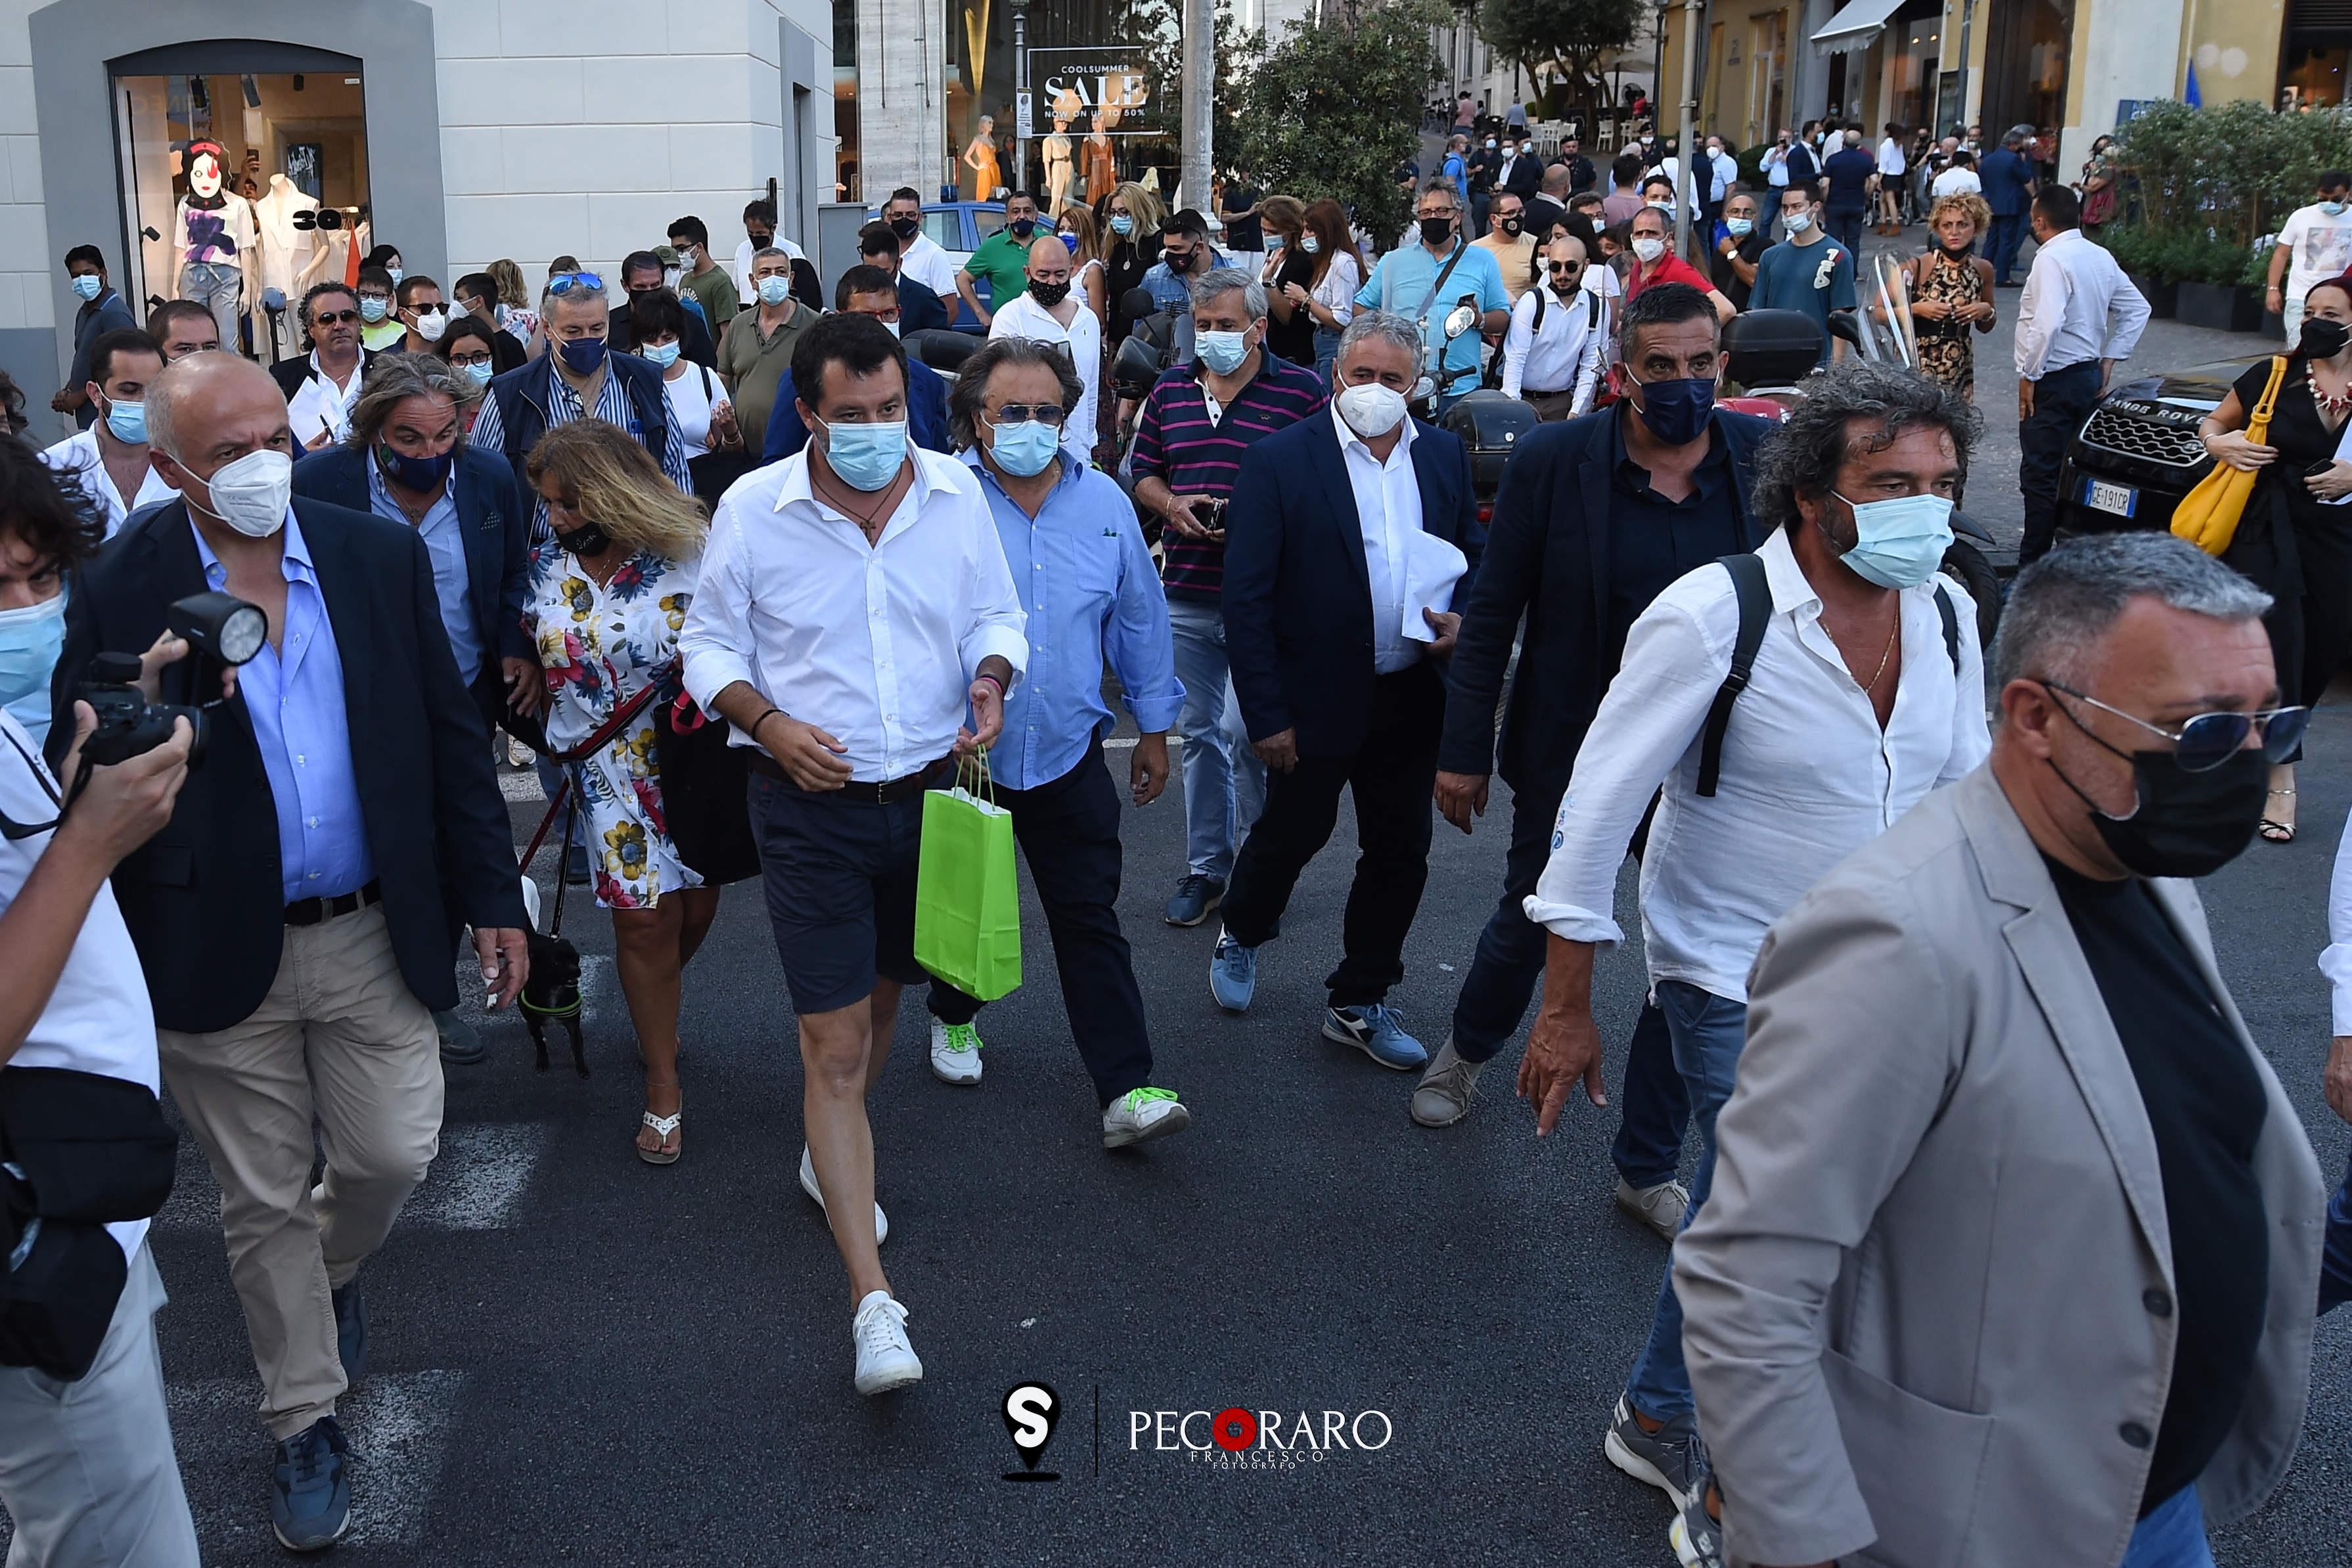 sal - 02 07 2021 Mateo Salvini a Salerno